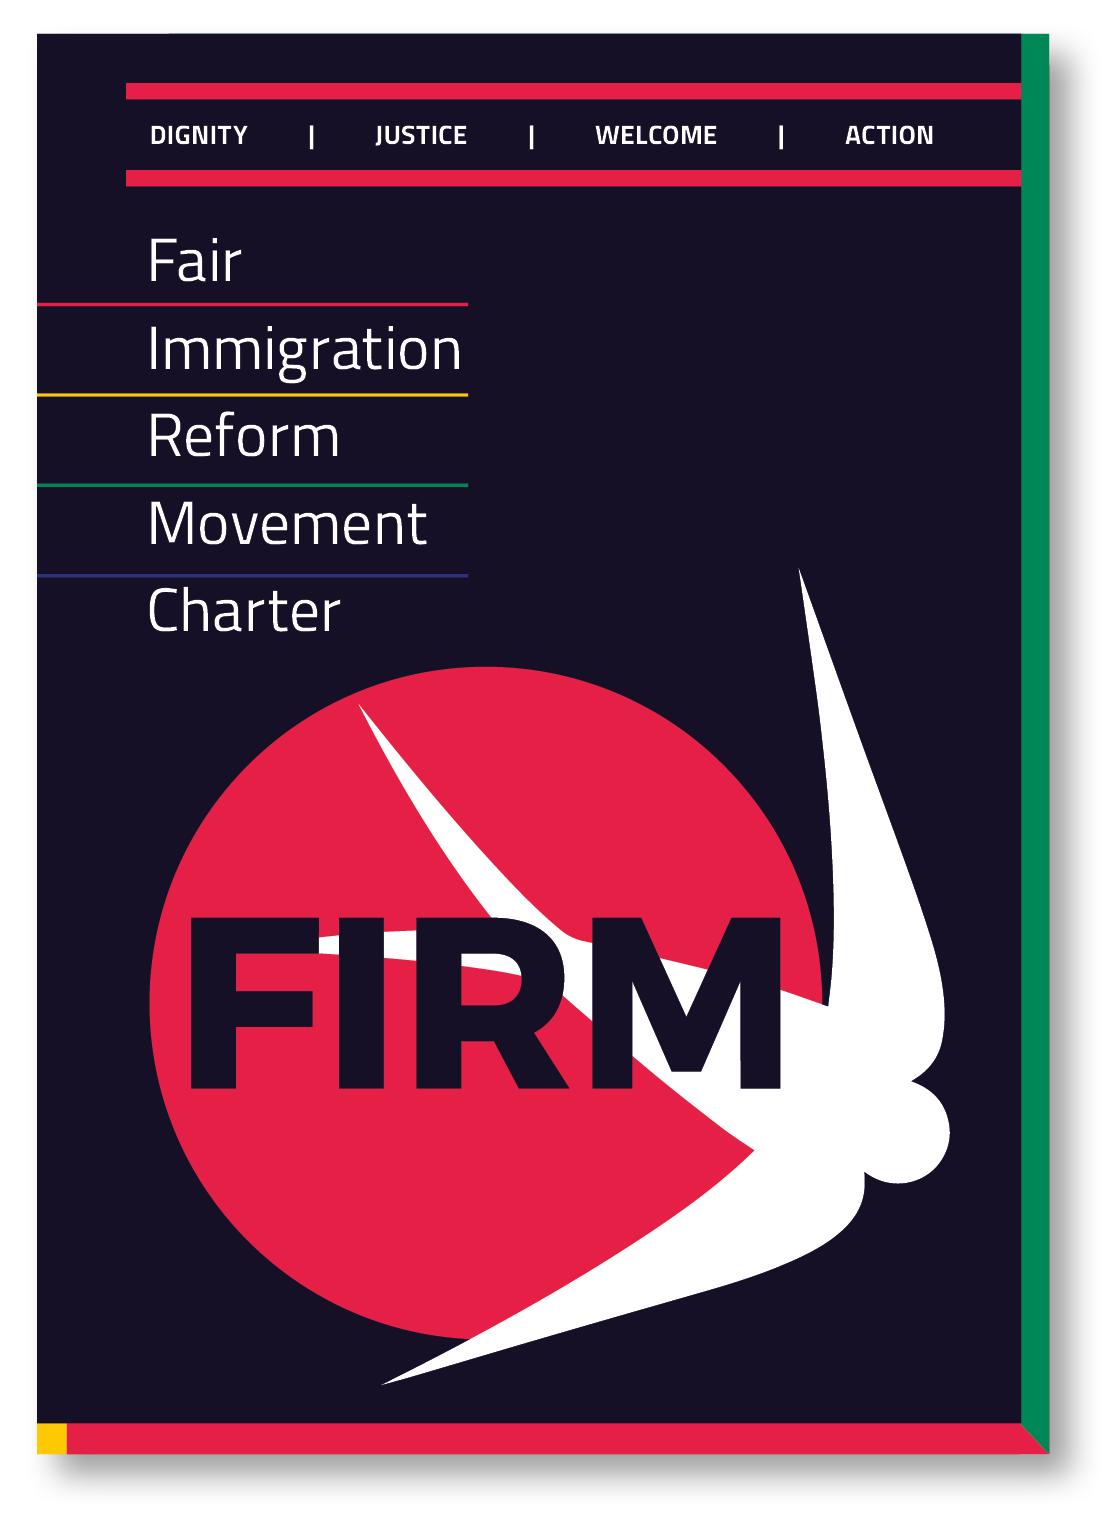 FIRM Charter thumb